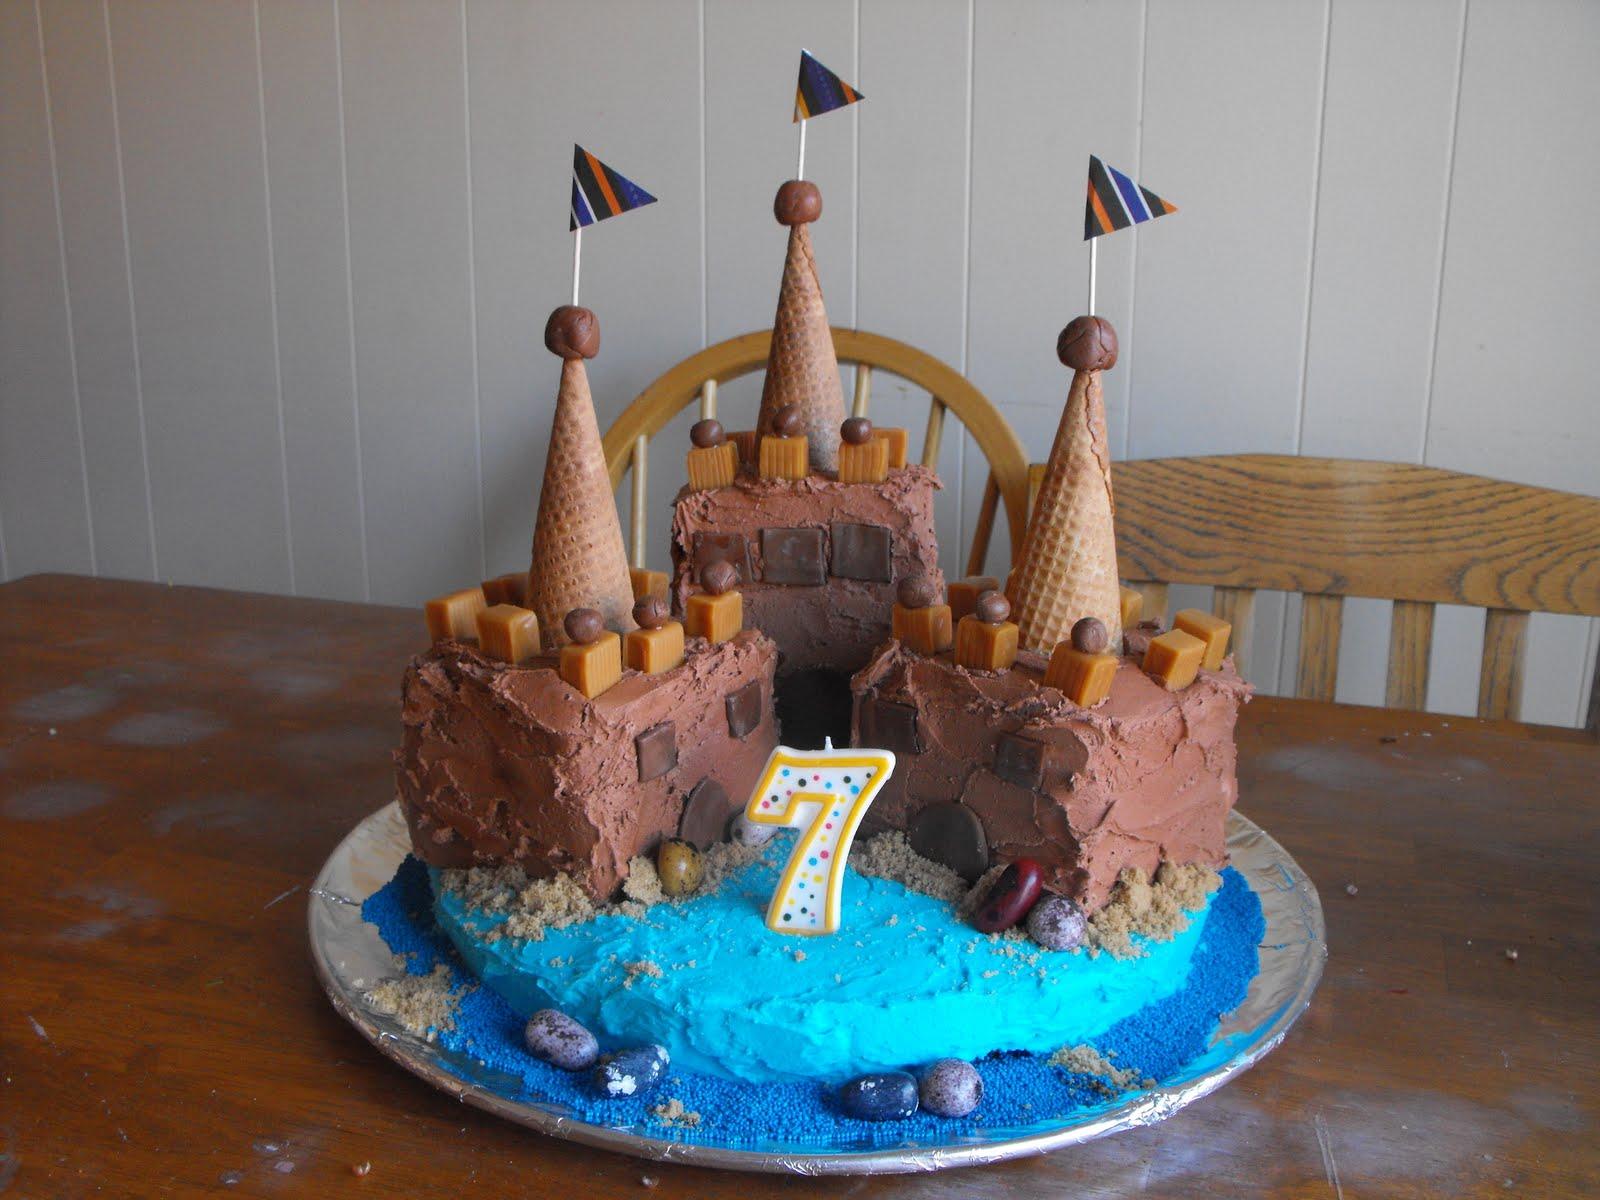 One Orange Giraffe: Sand Castle Birthday Cake